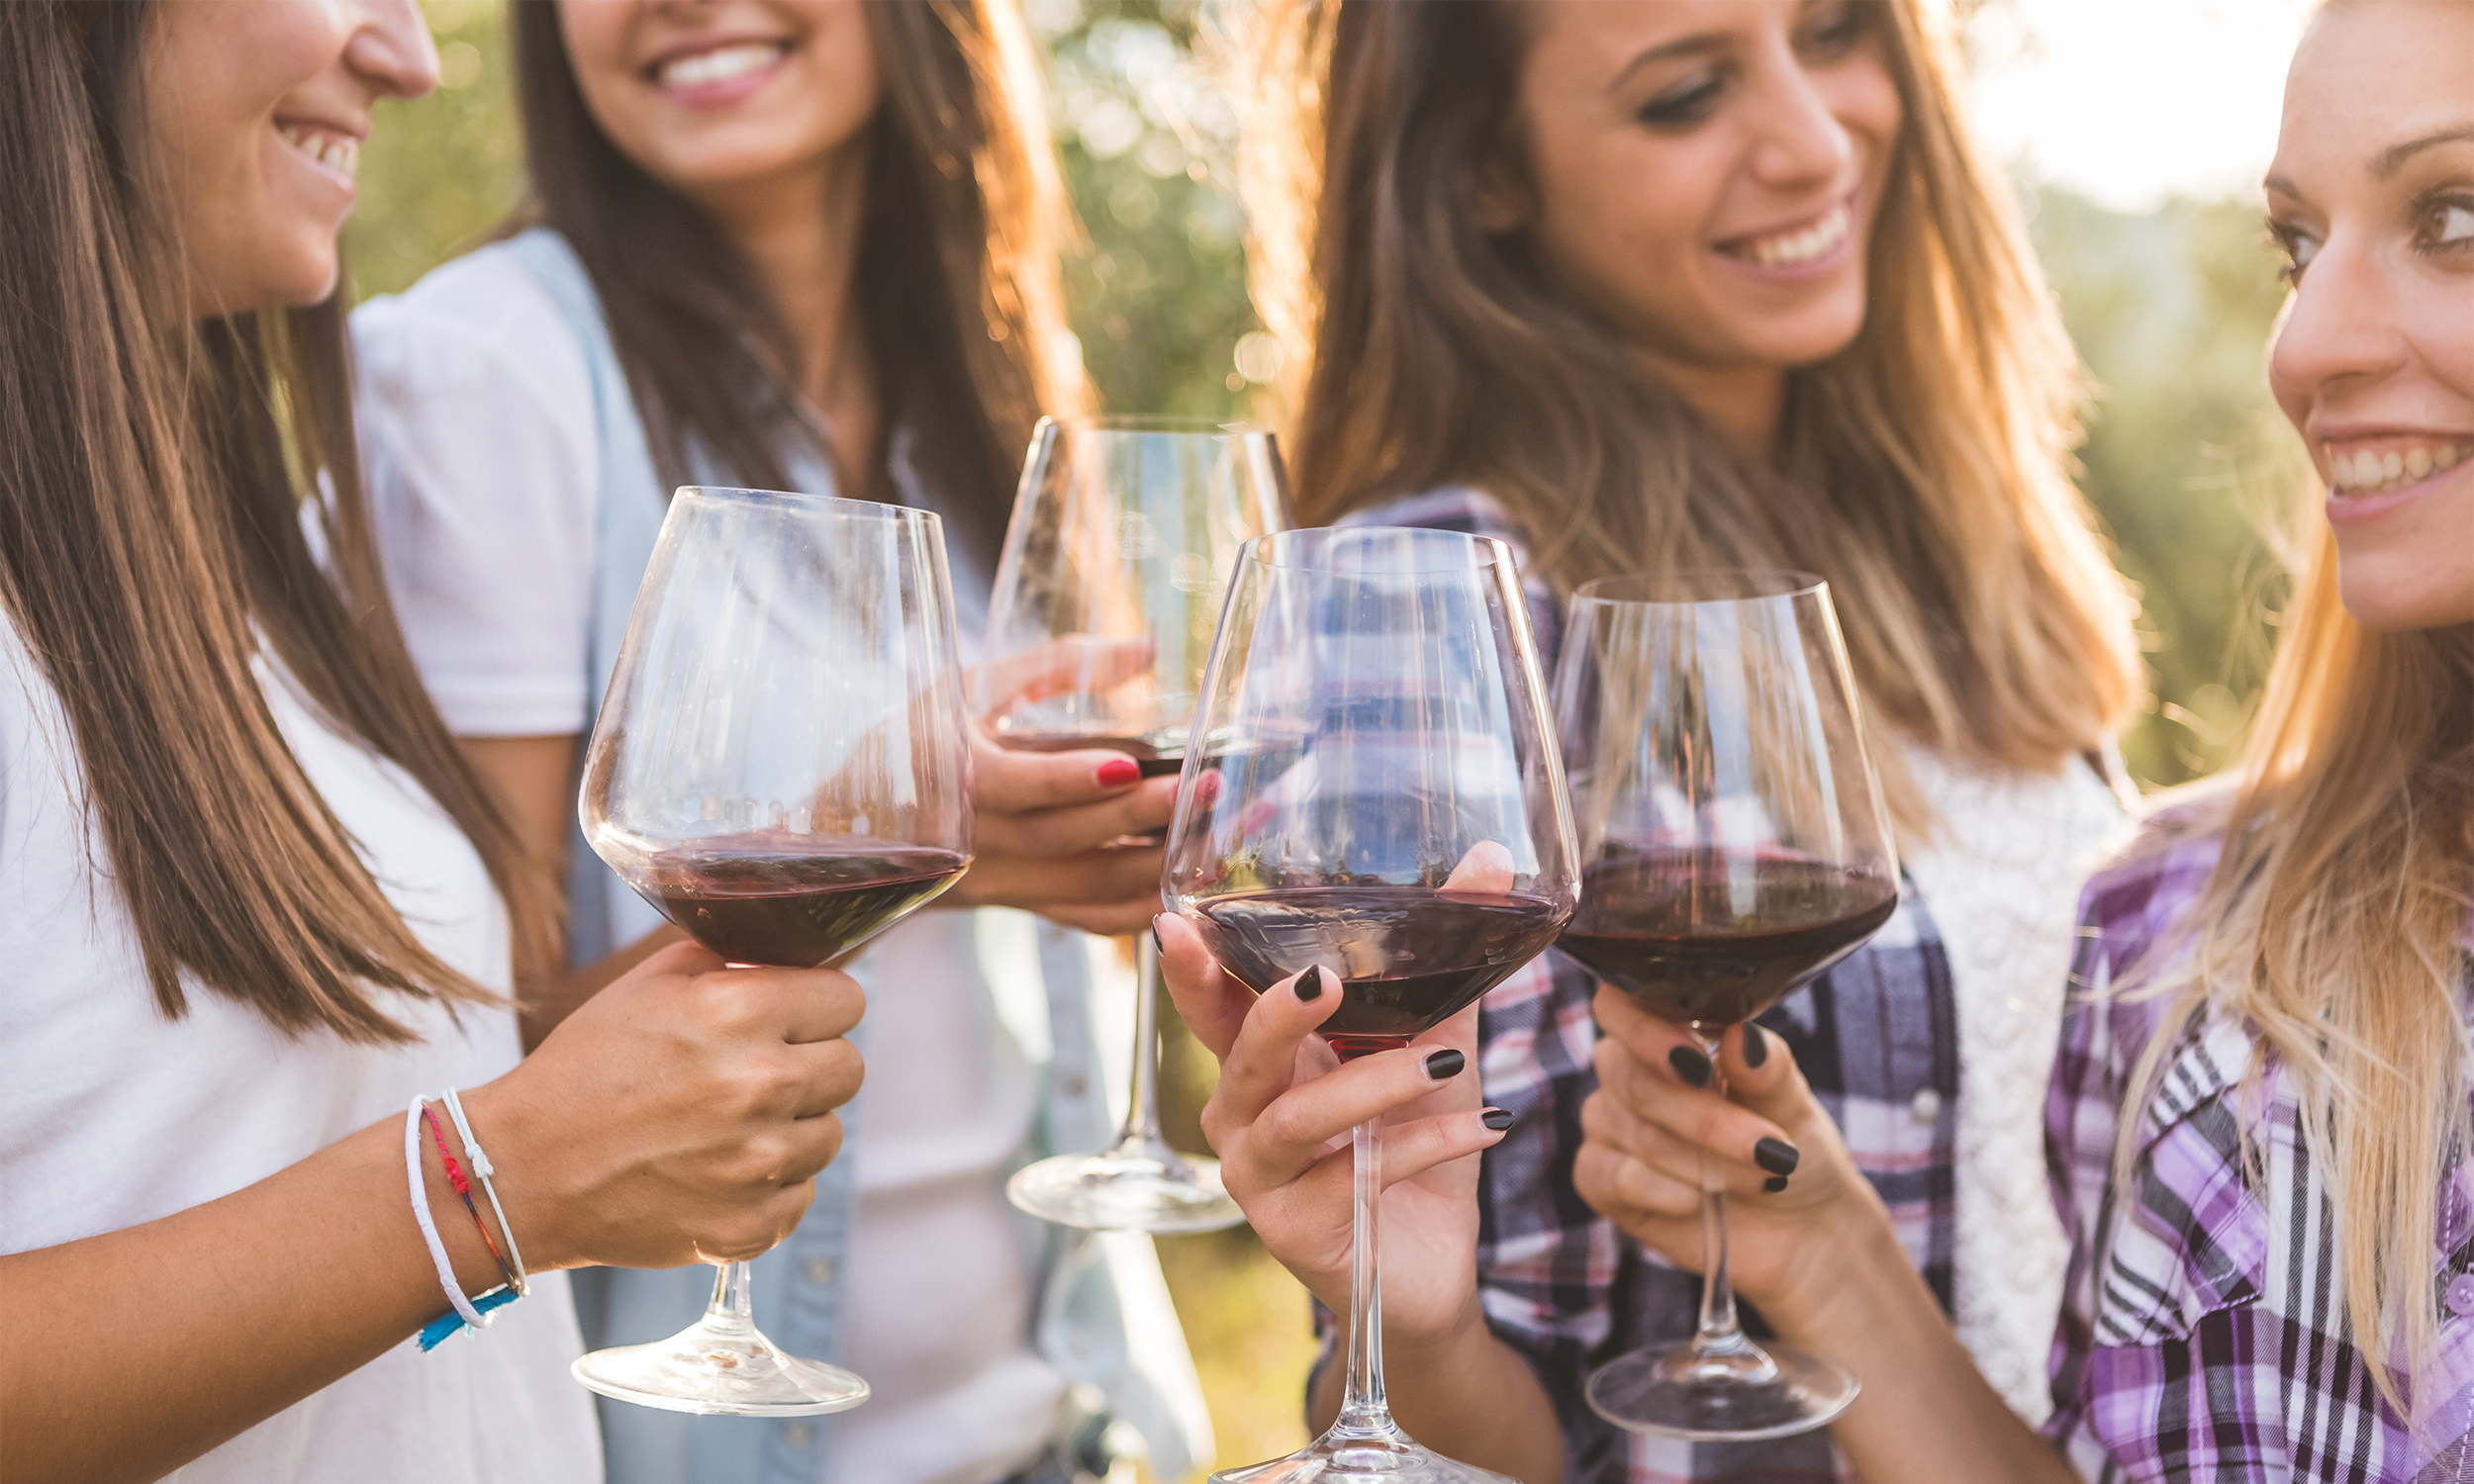 bachelorette party at vineyard